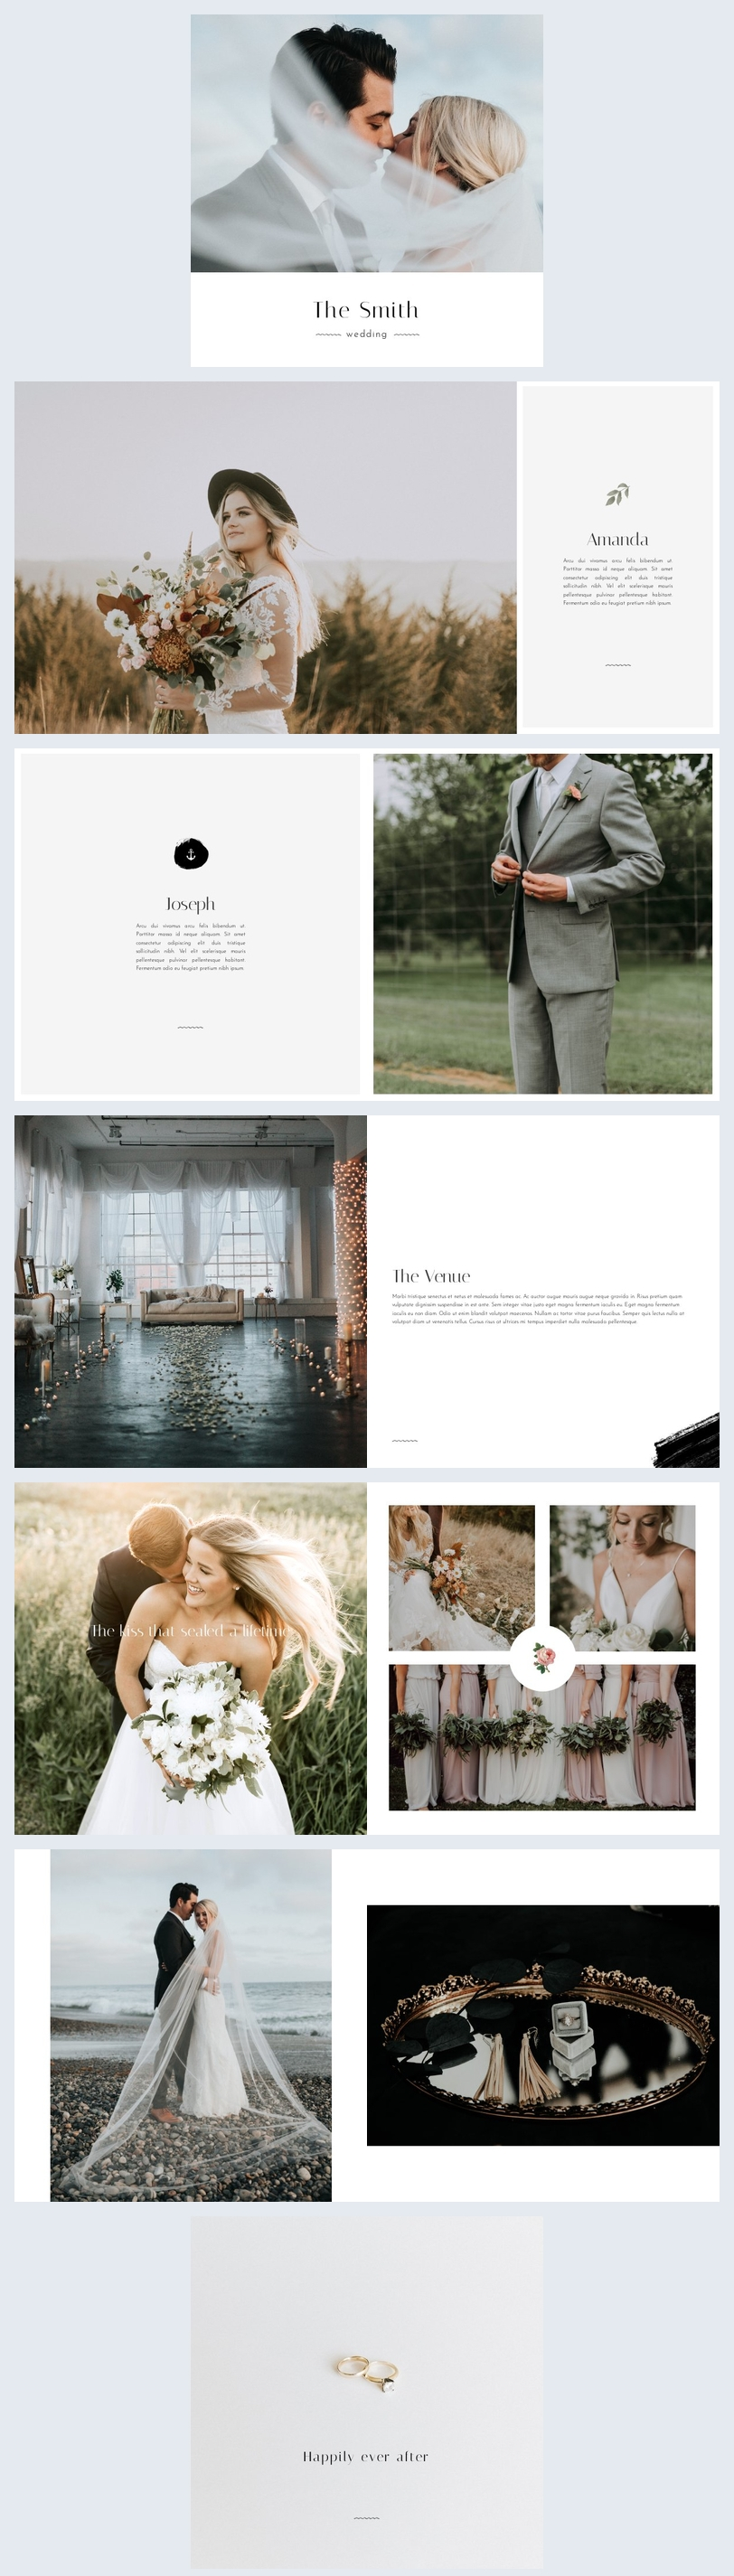 Álbum de Casamento Online